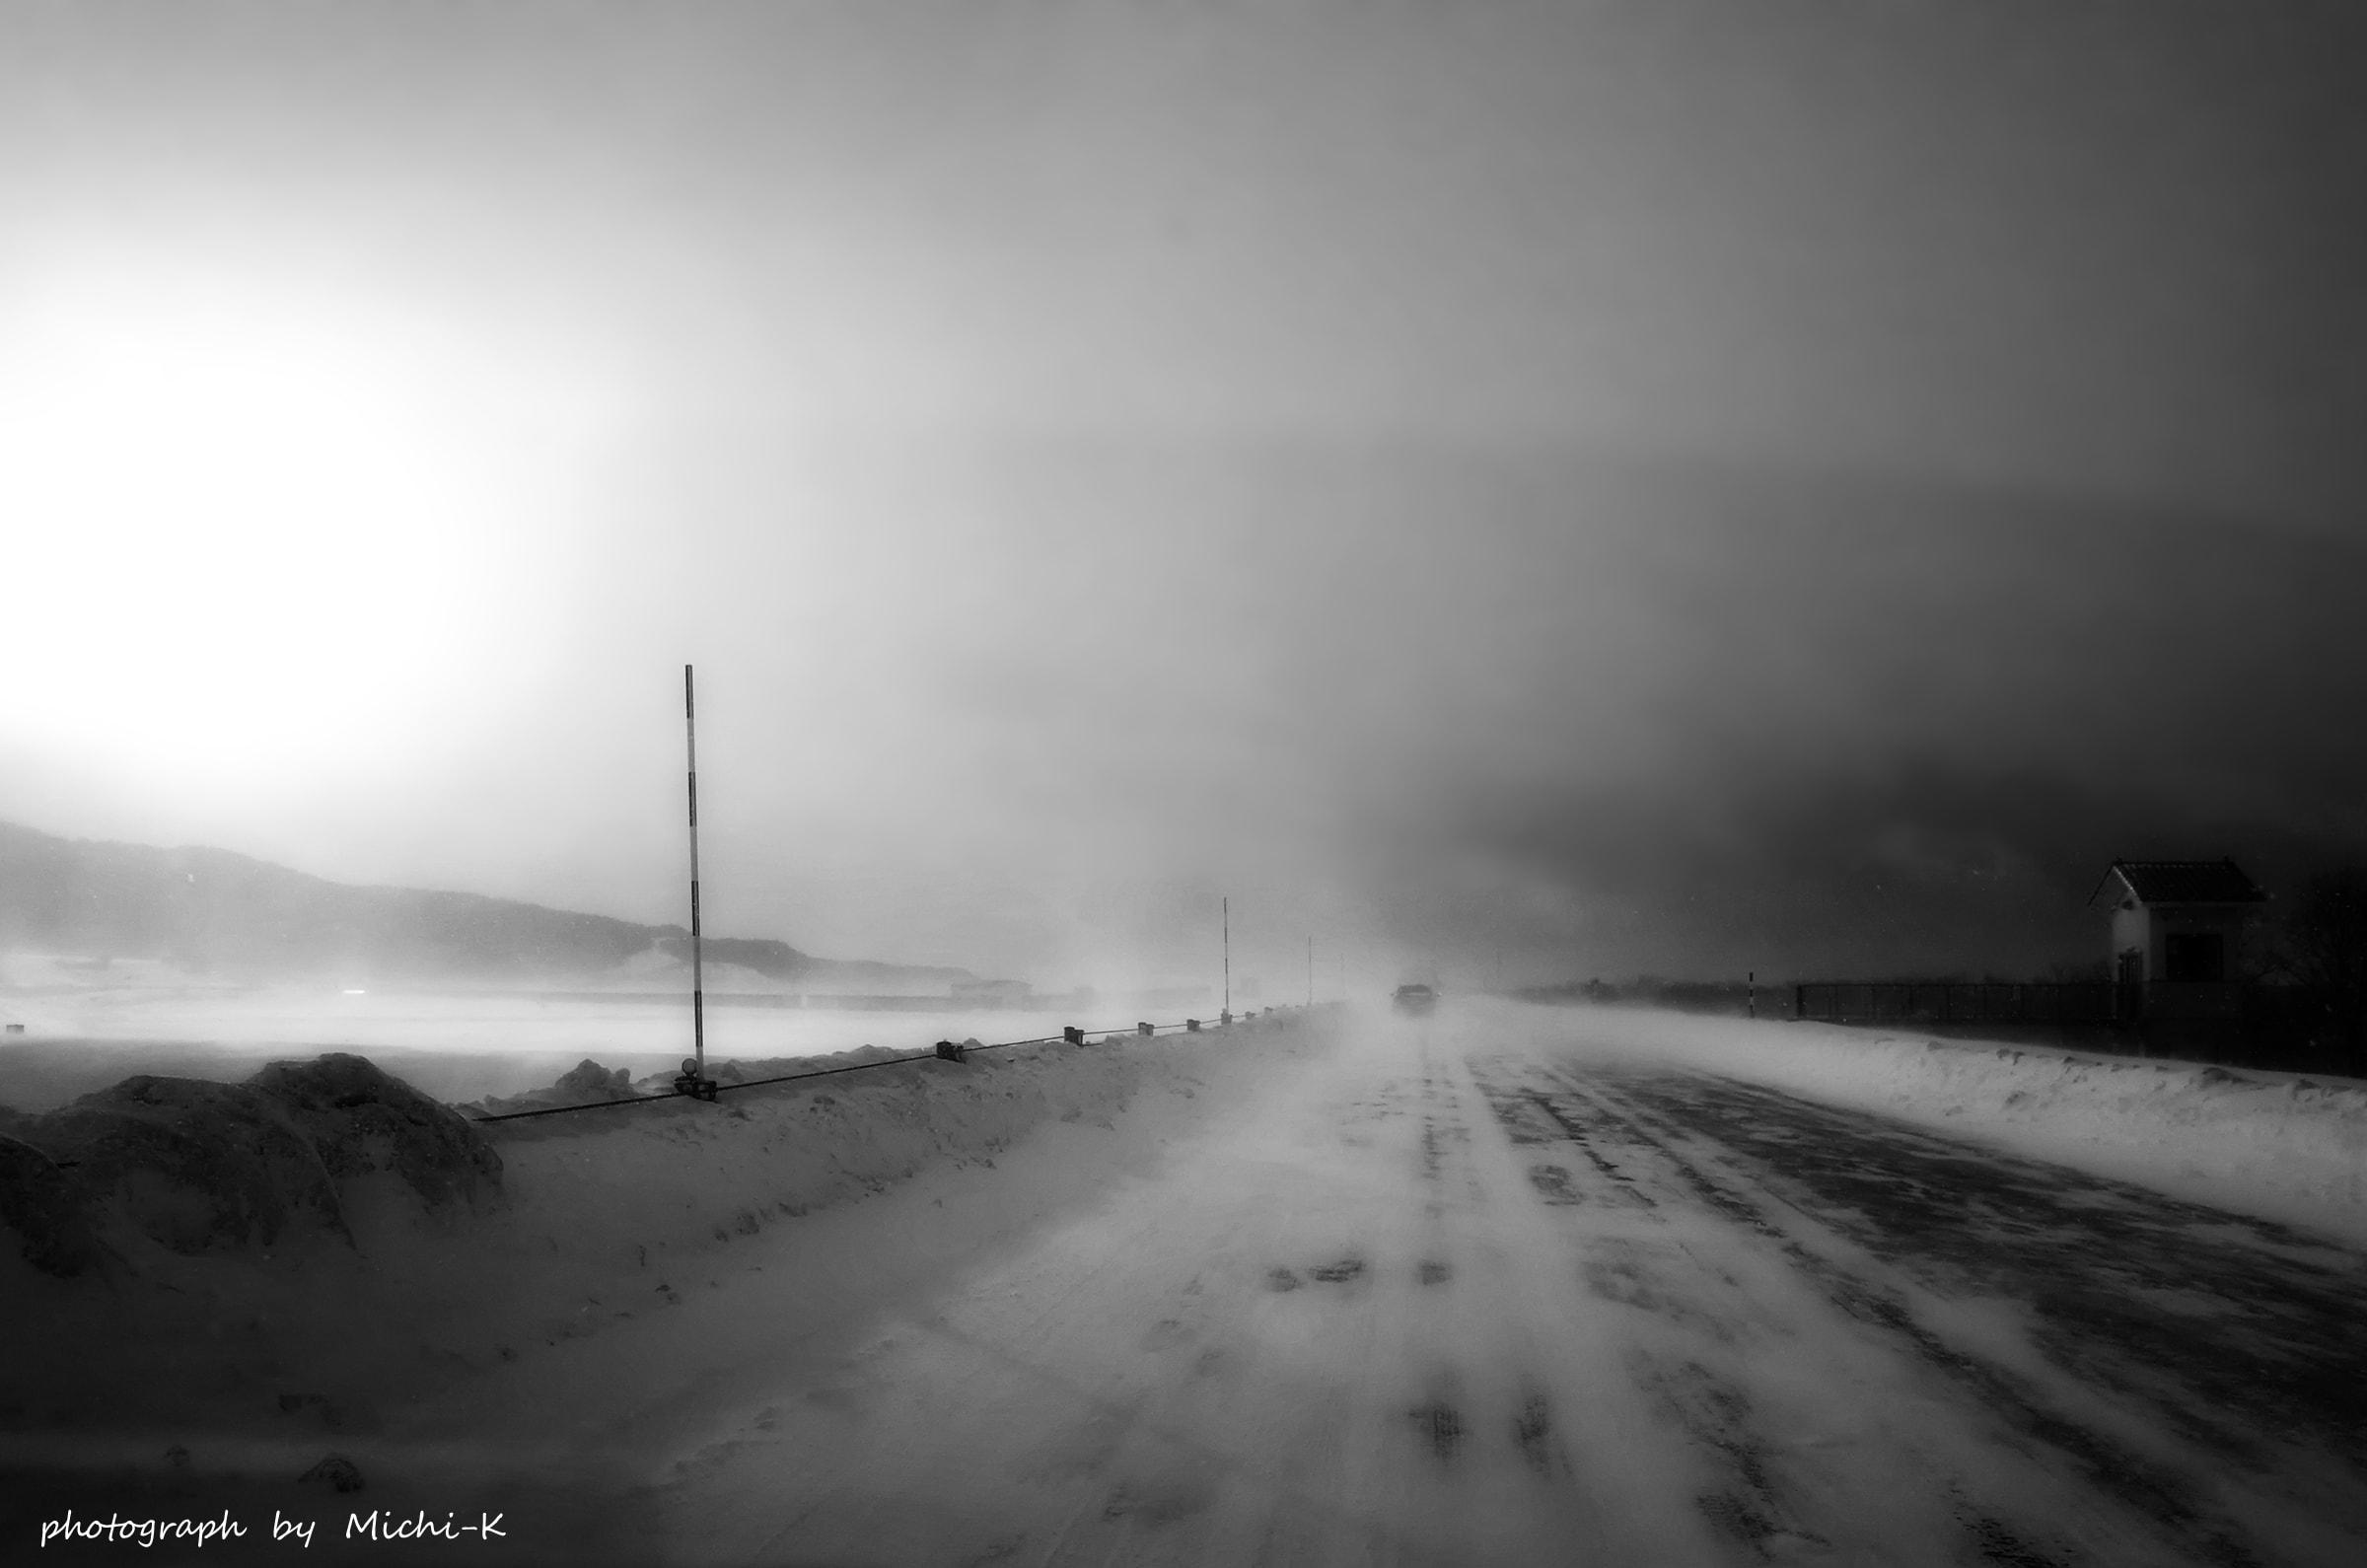 酒田市・冬の道